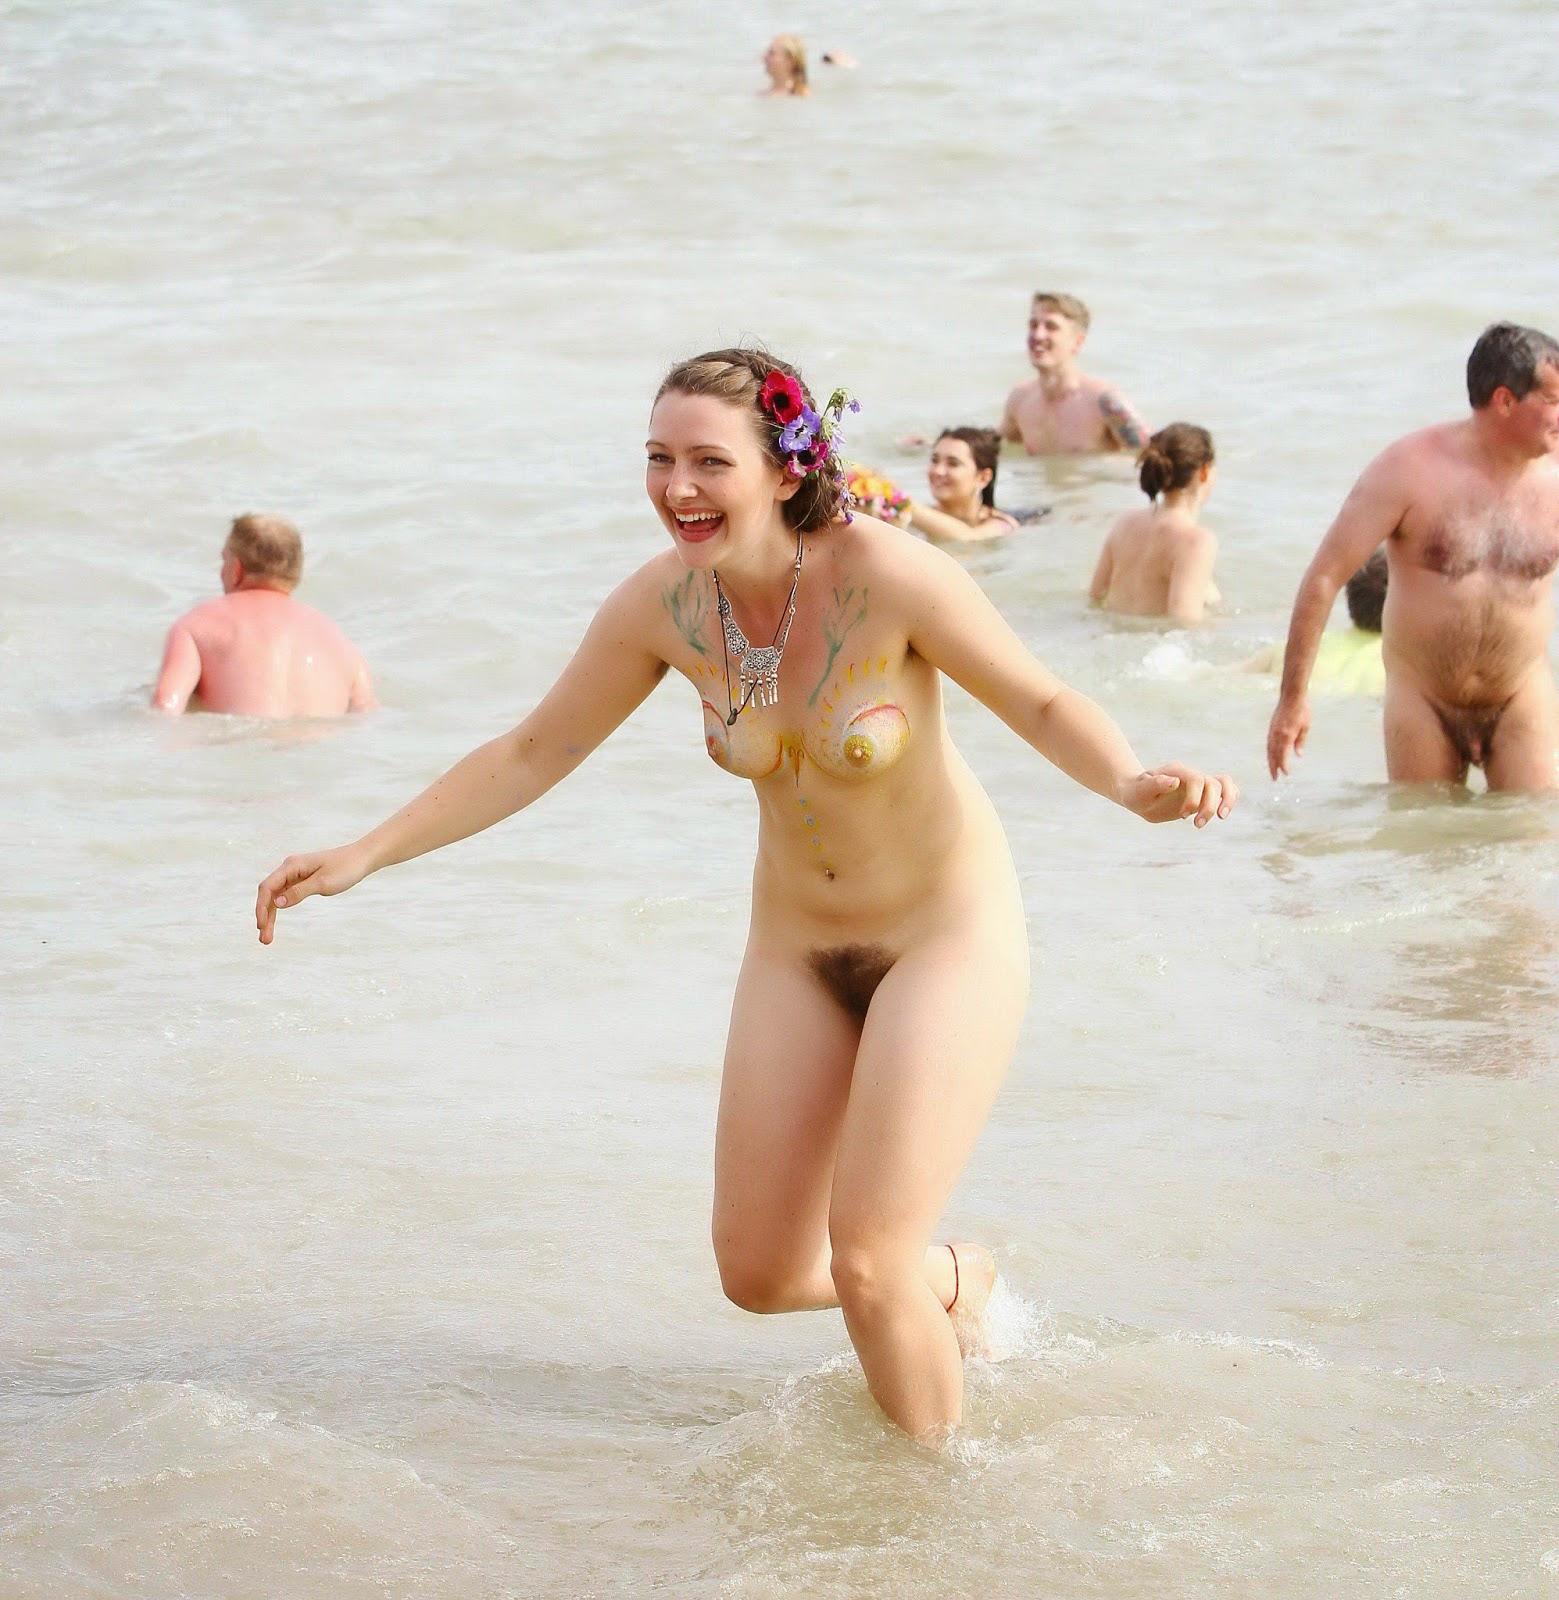 Hairy nudist chicks